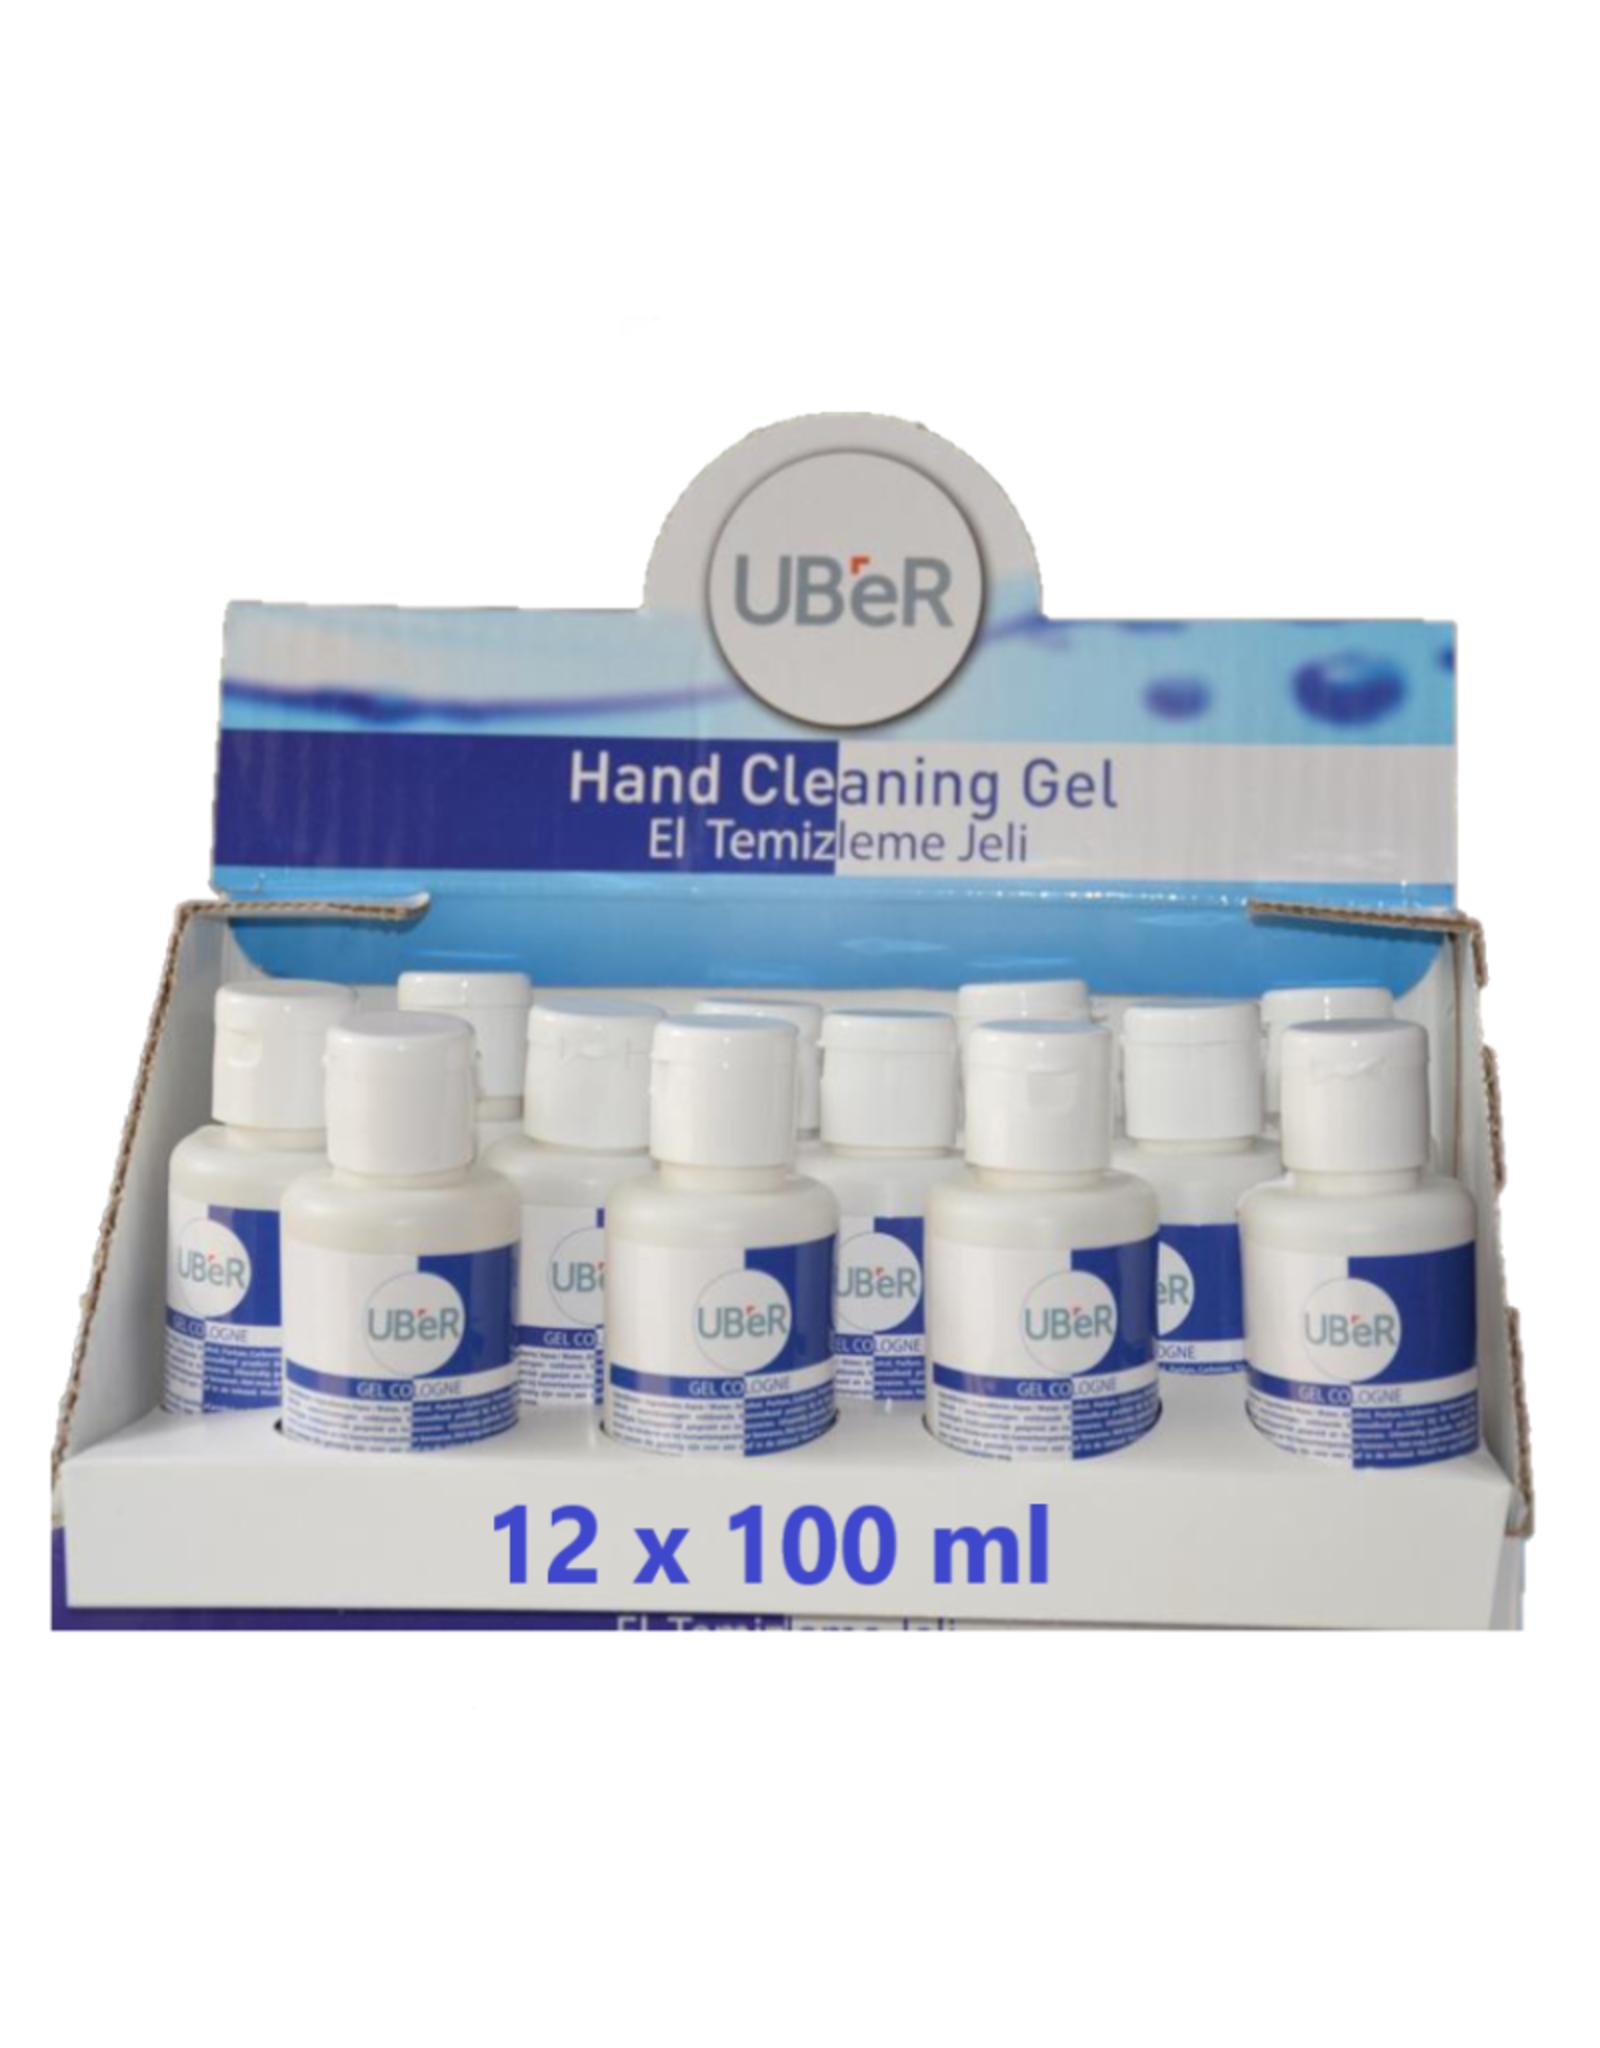 Uber handgel UBER Desinfecterende handgel  12x100 ml